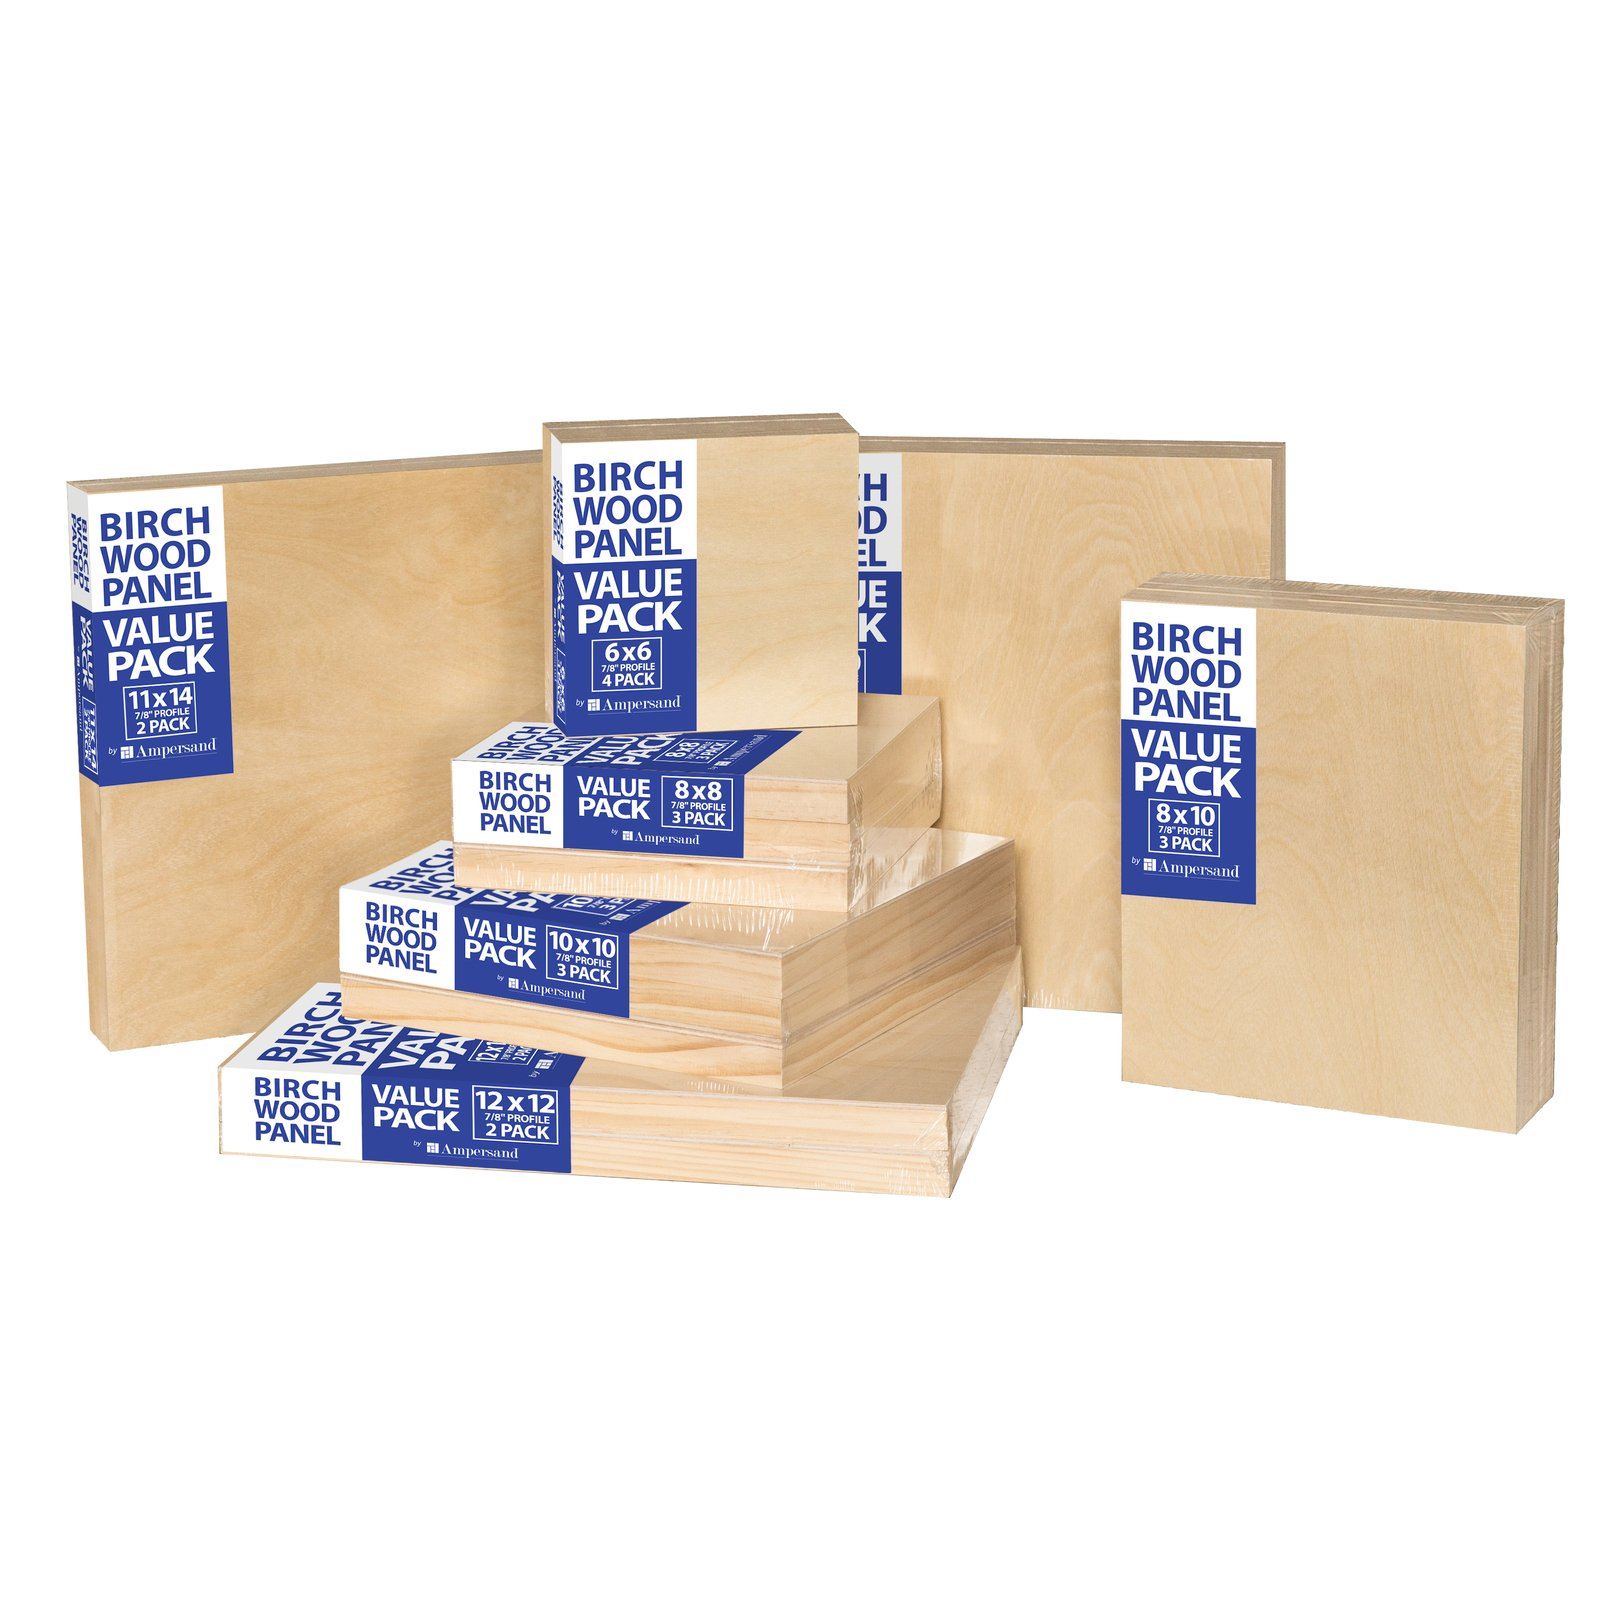 Birch Wood Panel Value Packs